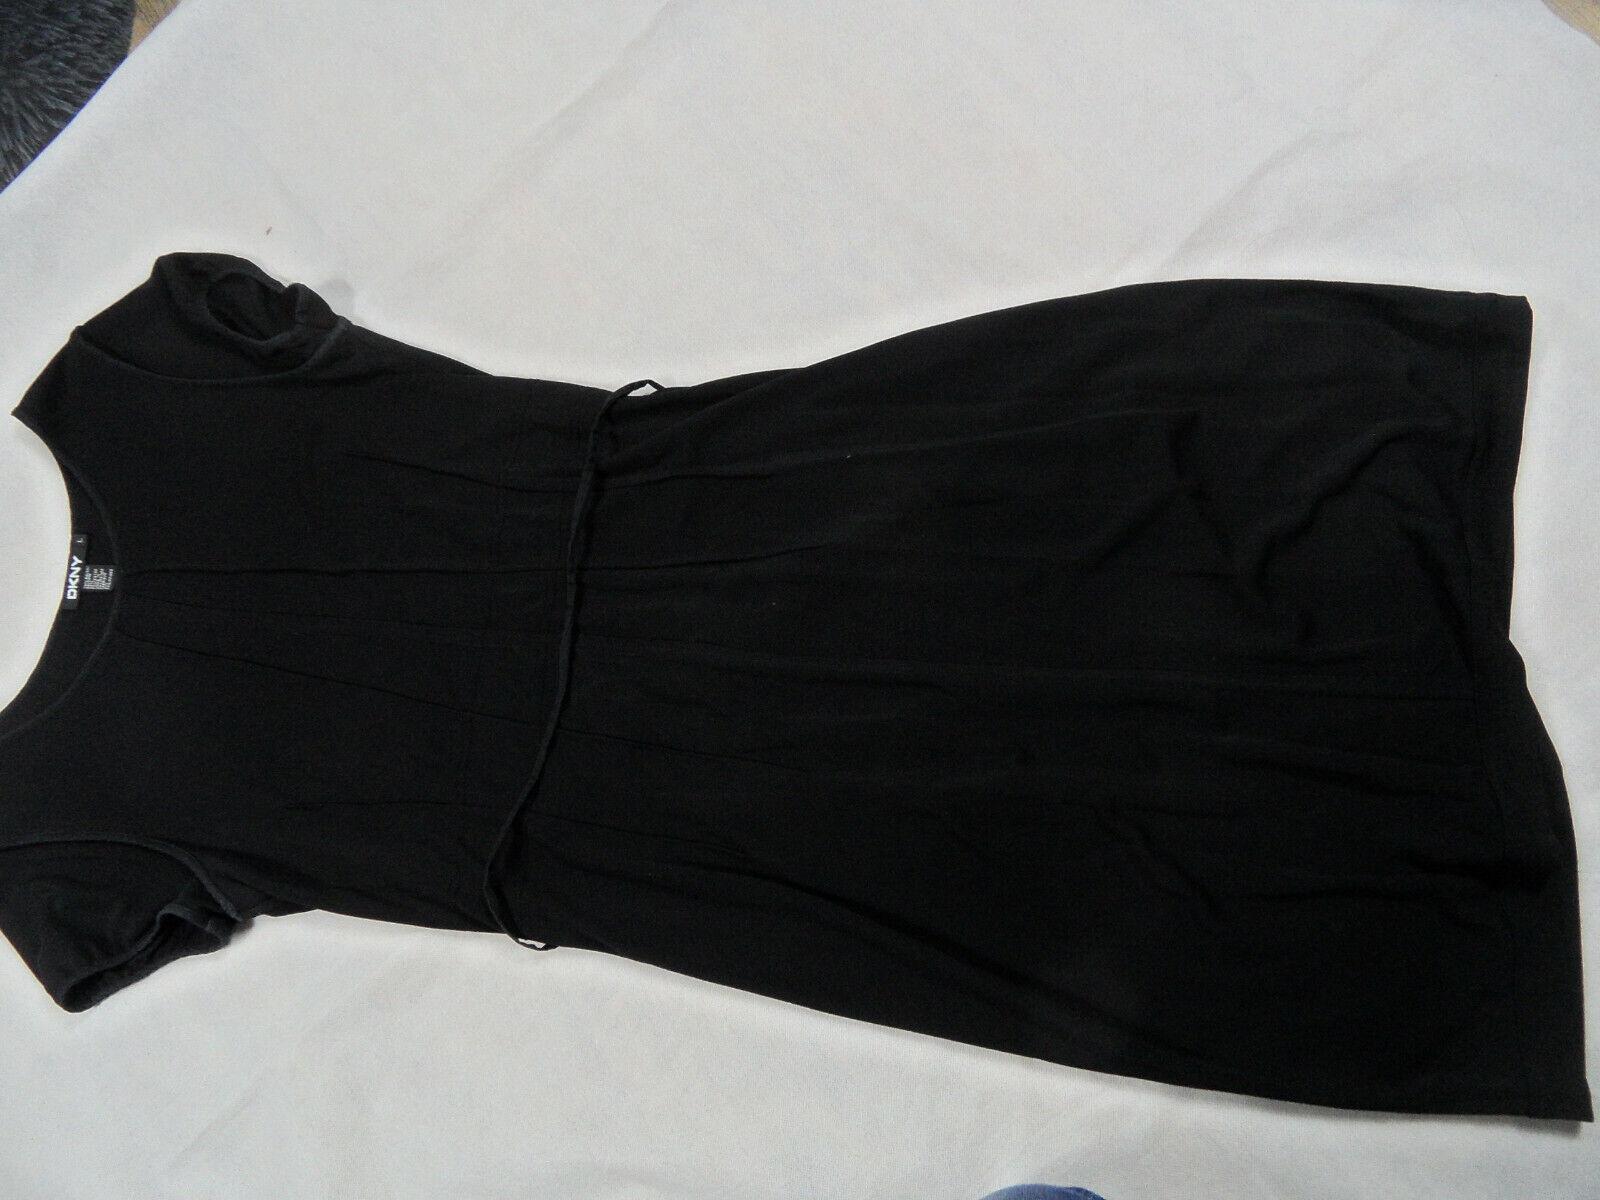 DKNY schönes Stretchkleid schwarz Gr. L TOP BB120